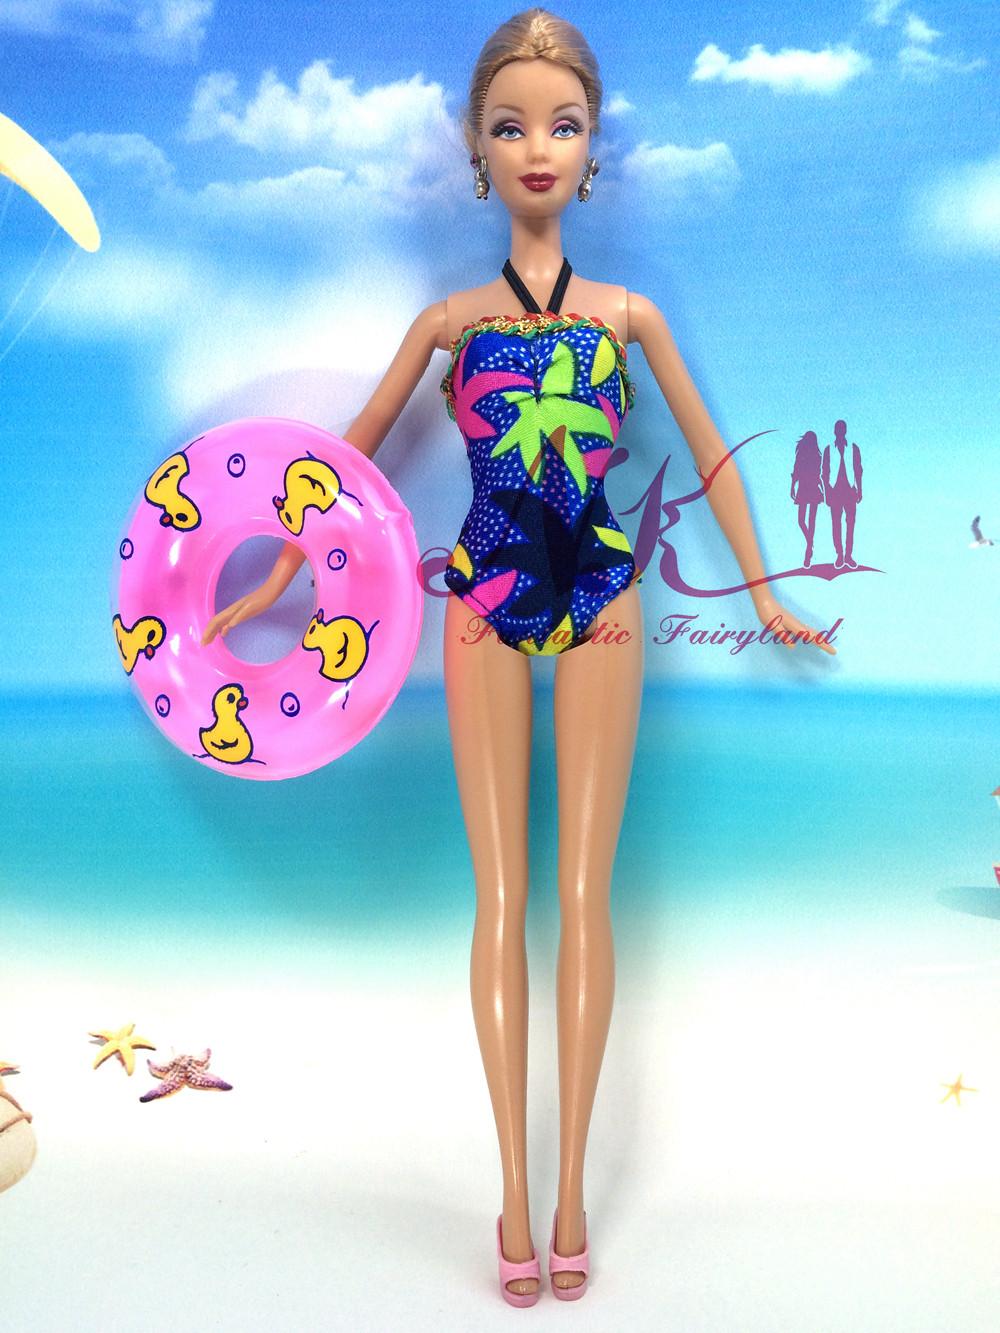 NK Doll corset Swimwear  Pants+Slippers+Swimming Buoy Lifebelt Ring For Barbie Doll Finest Woman' Reward 028A